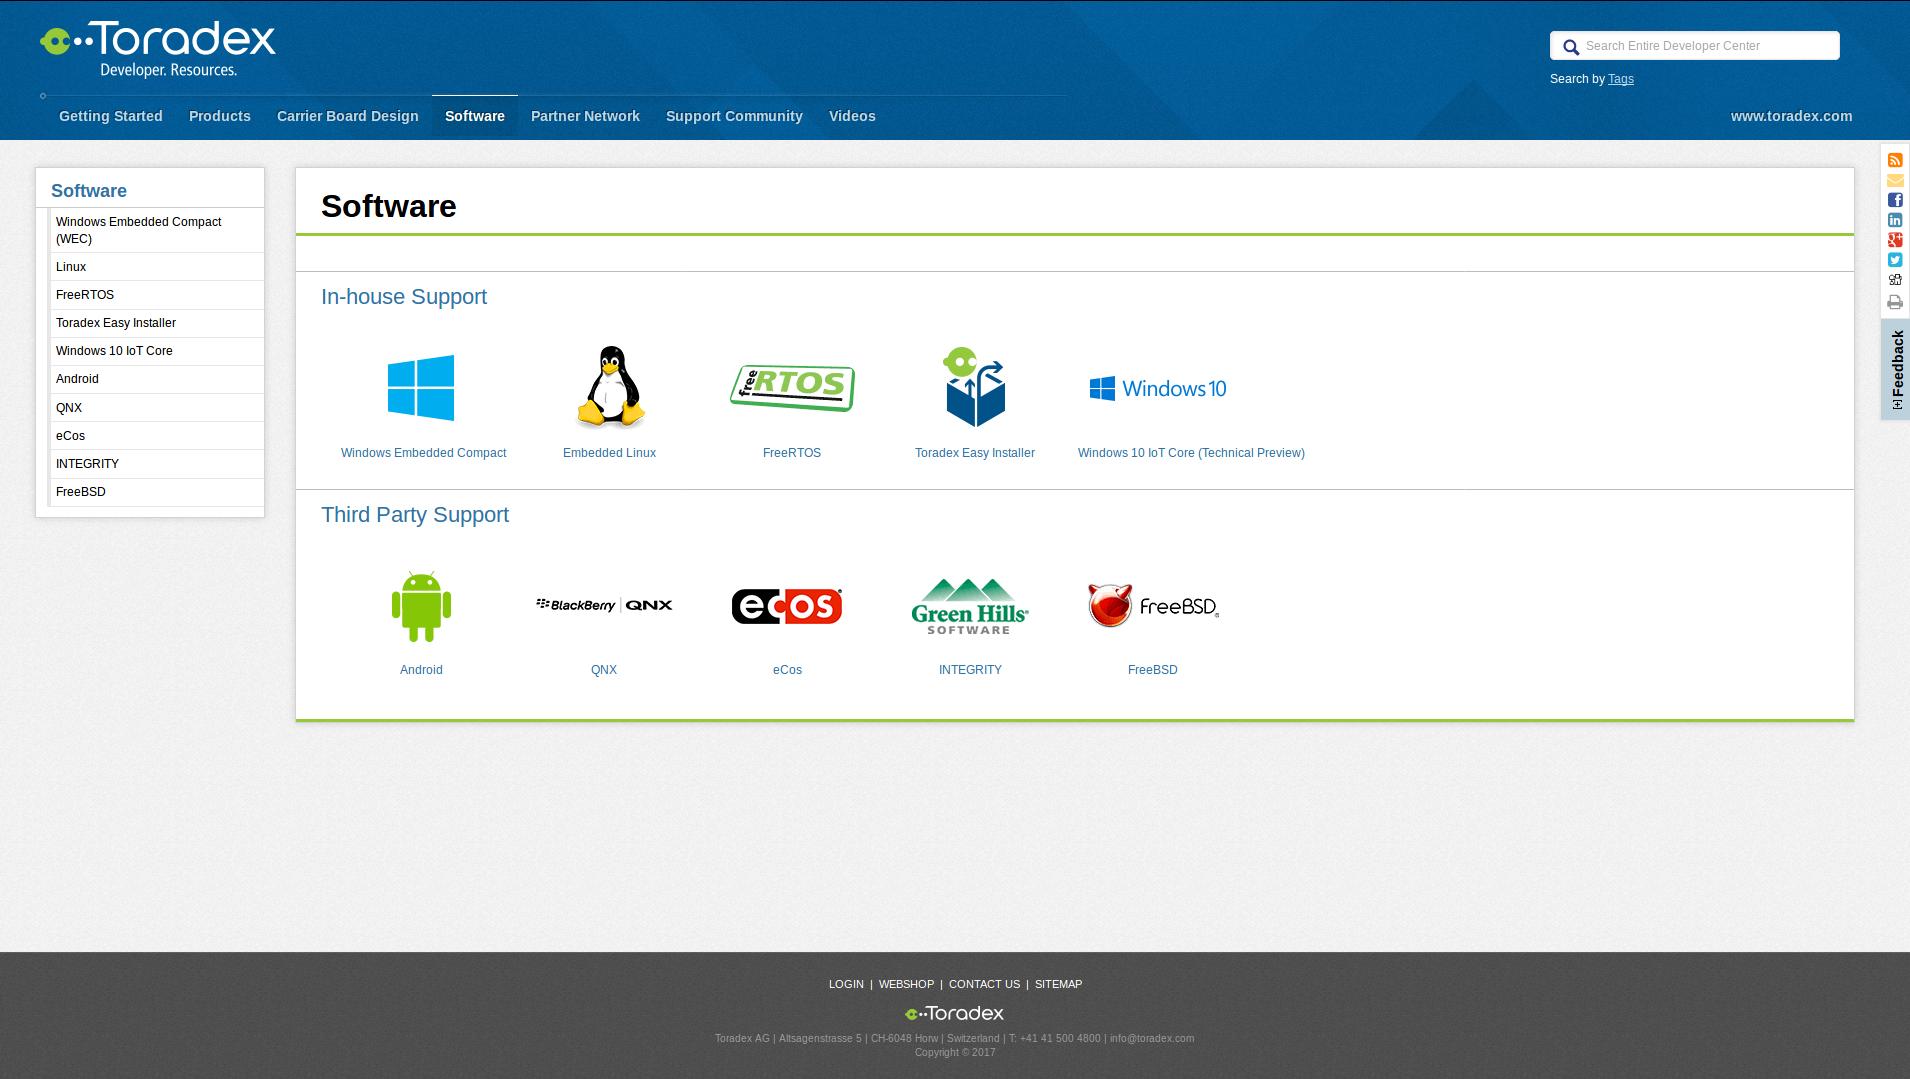 Software tab